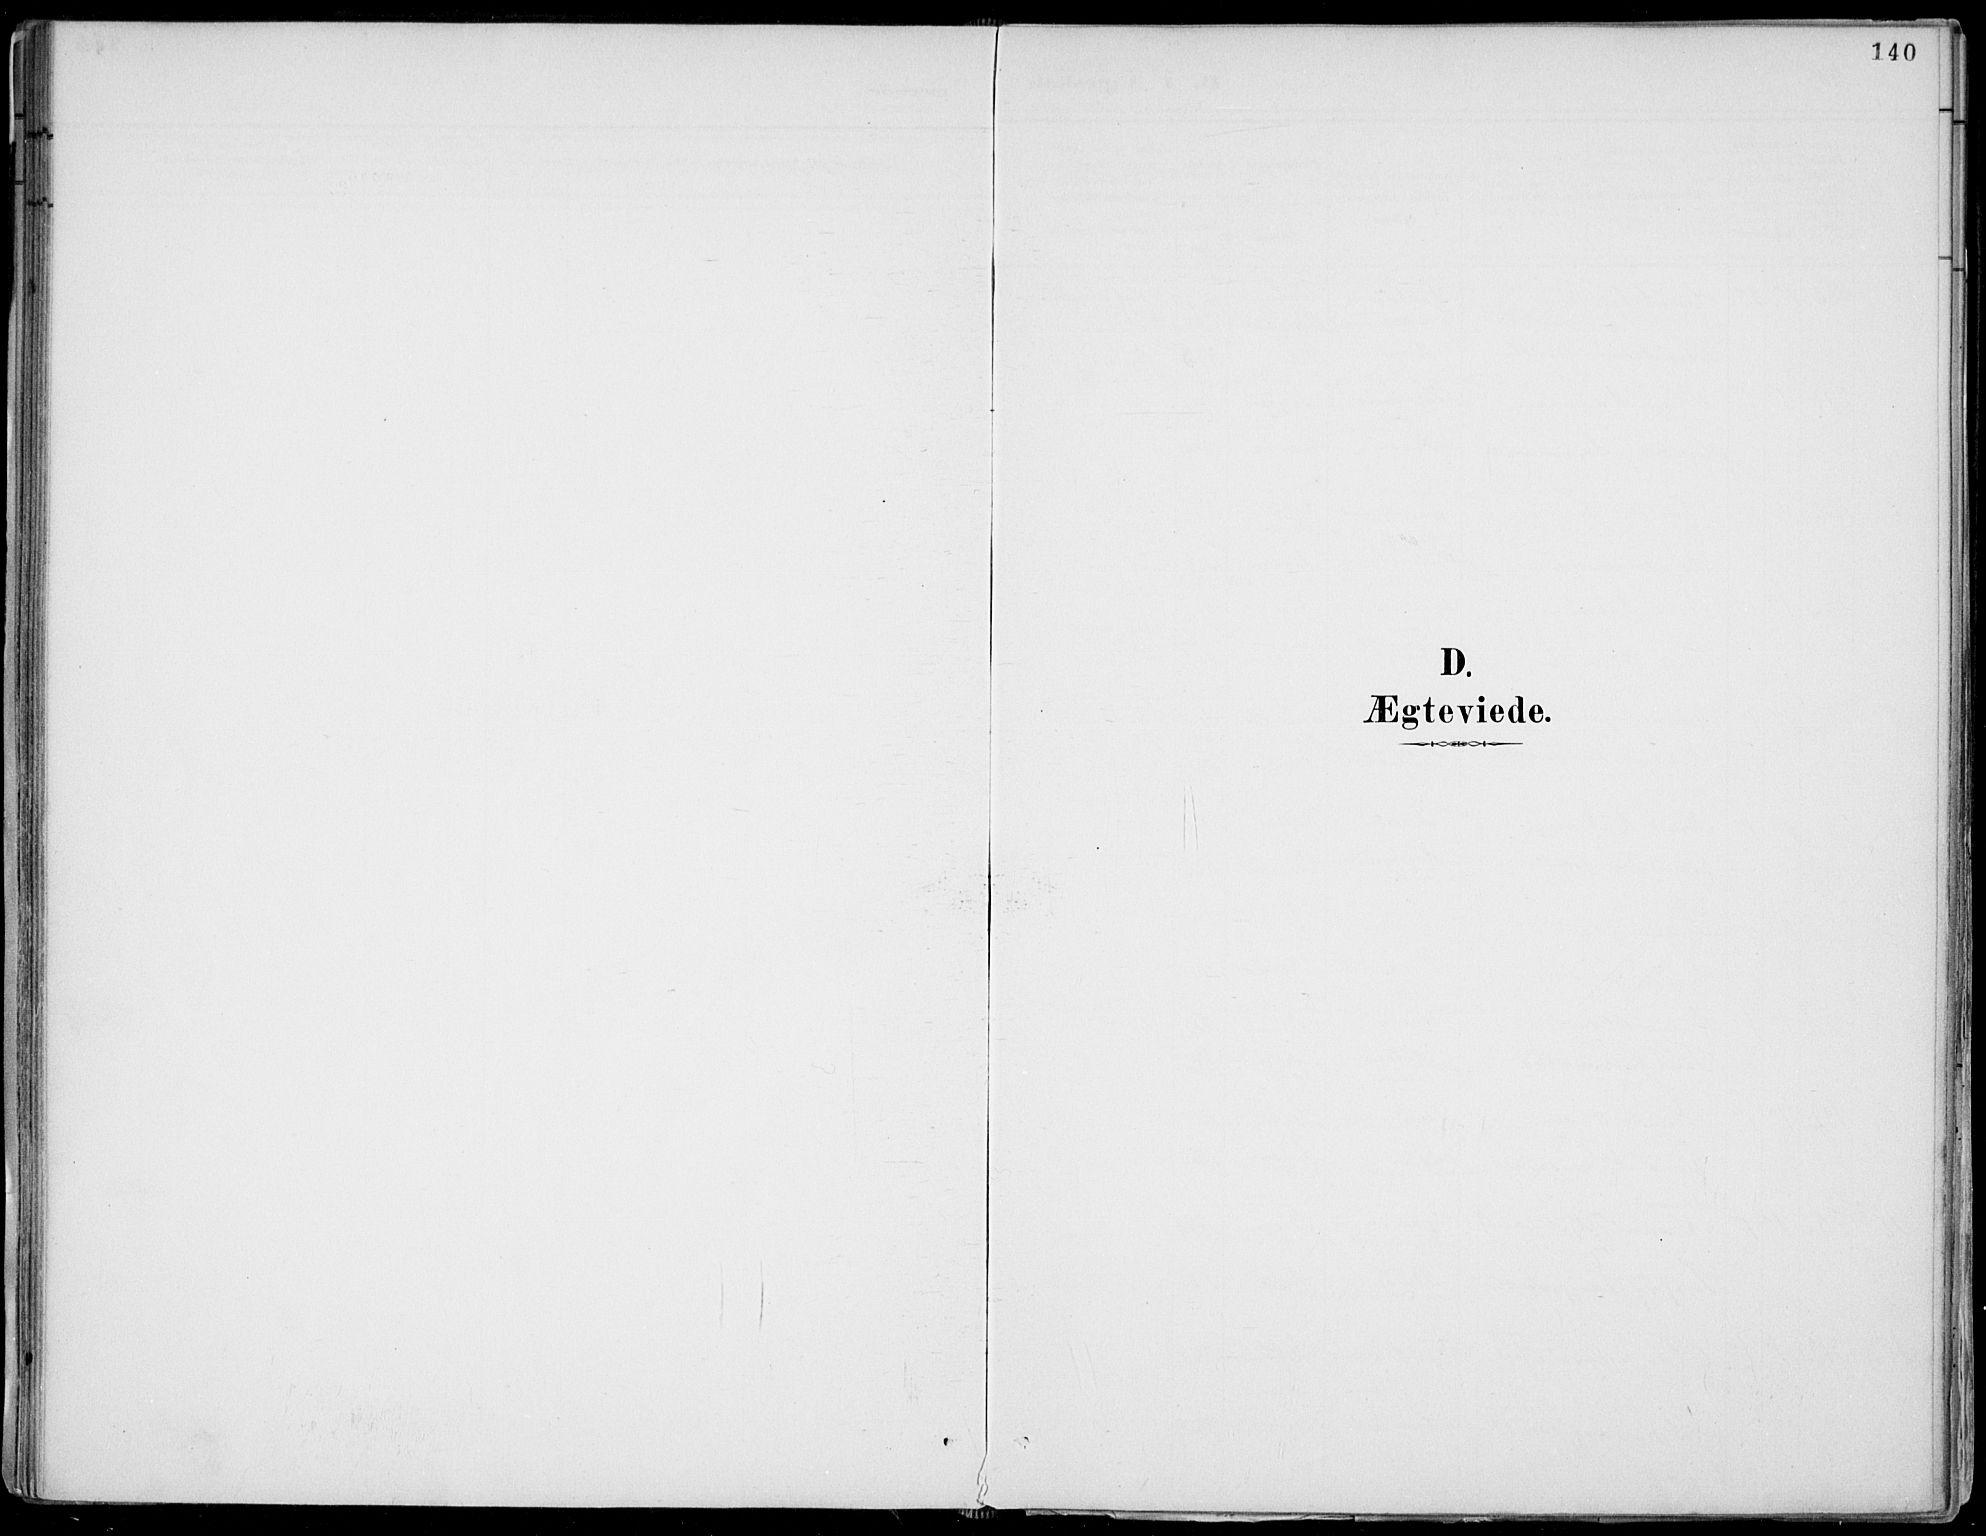 SAKO, Fyresdal kirkebøker, F/Fa/L0007: Parish register (official) no. I 7, 1887-1914, p. 140